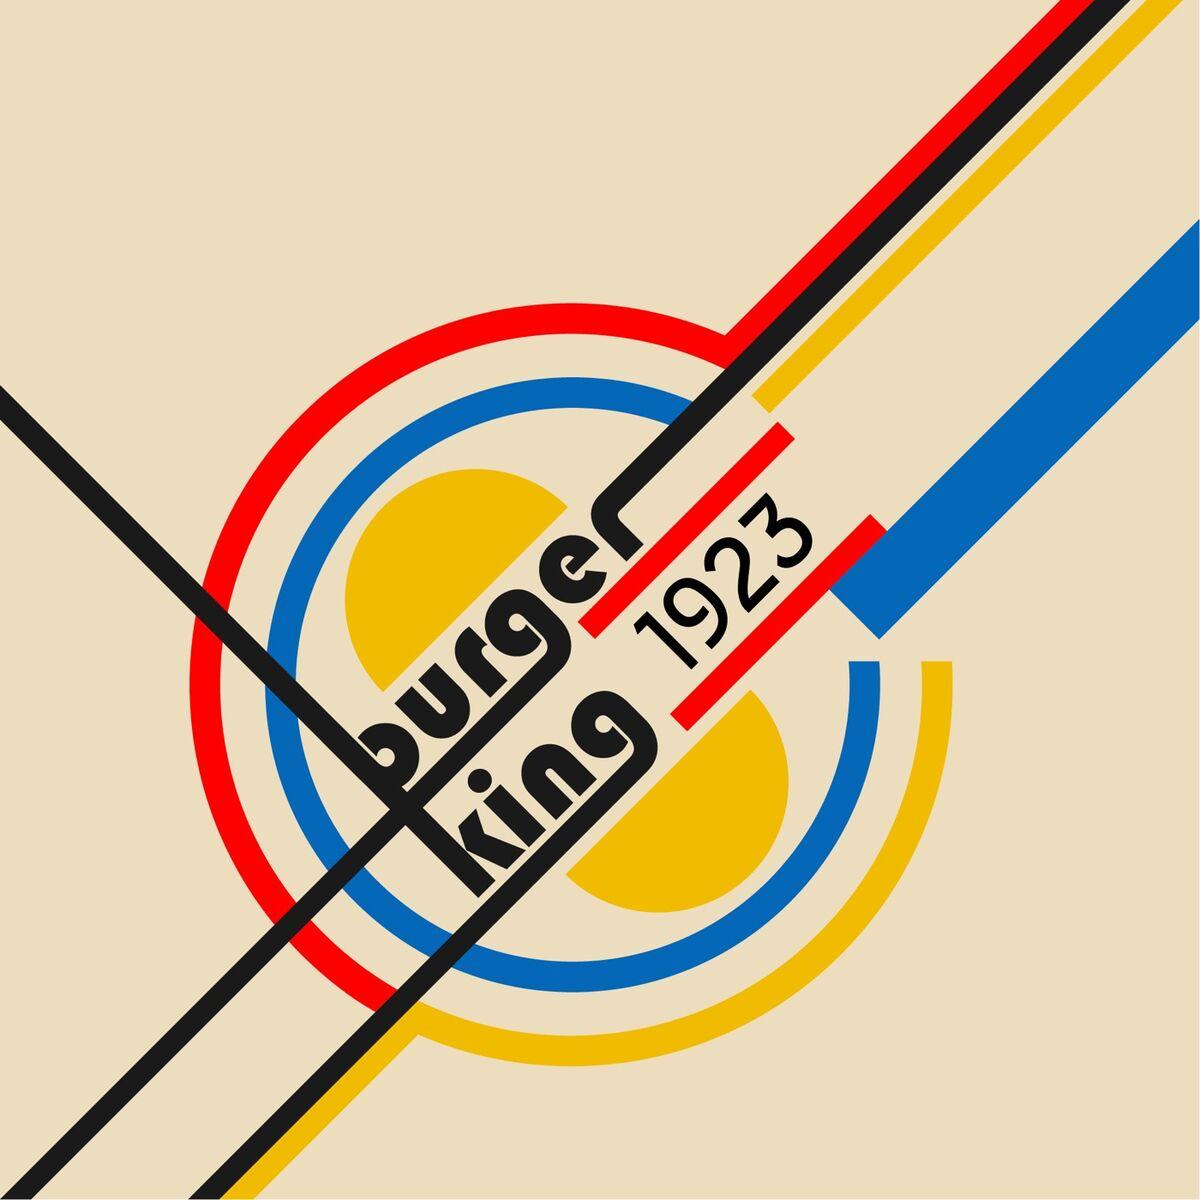 Designers Put a Bauhaus Spin on Famous Logos - Artsy